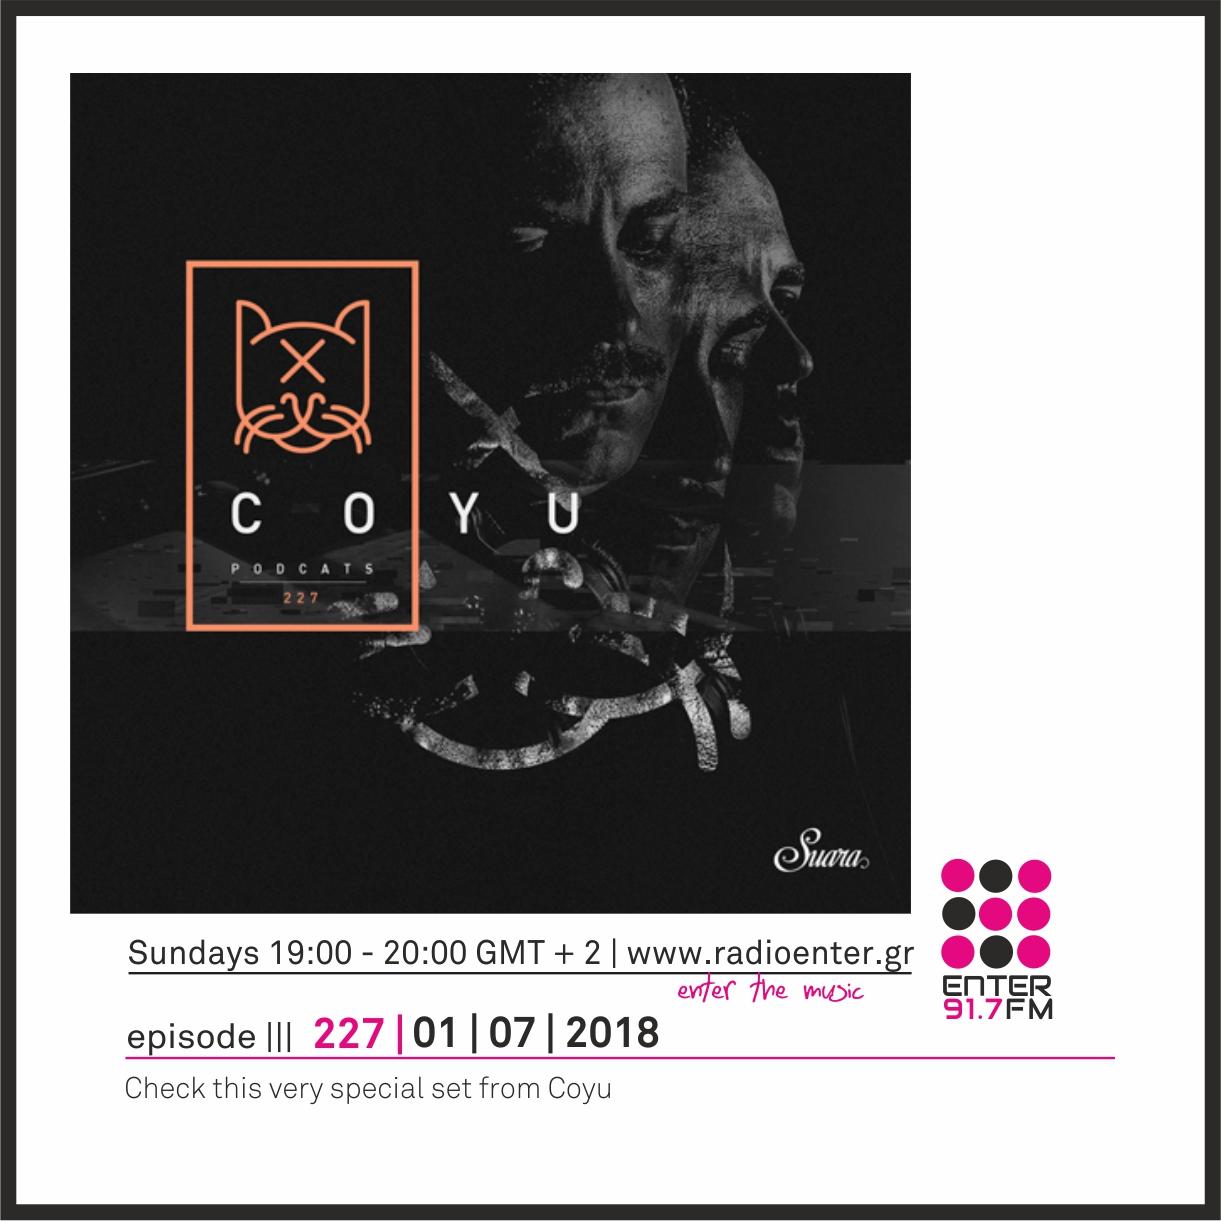 2018.07.01 - Coyu presents Suara PodCats 227